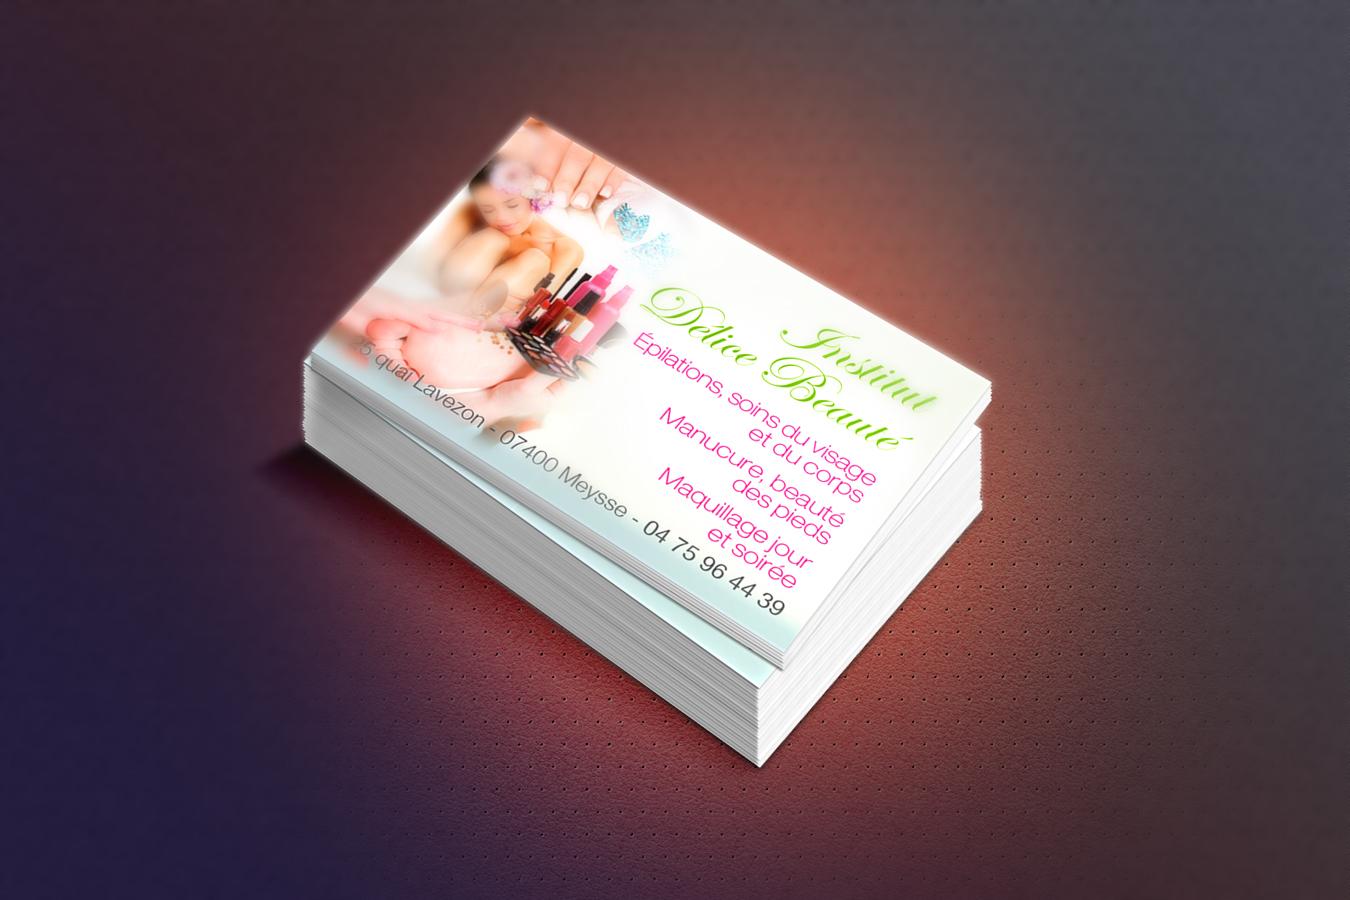 Cartes De Visite Institut Delice Beaute Agence 2S Com